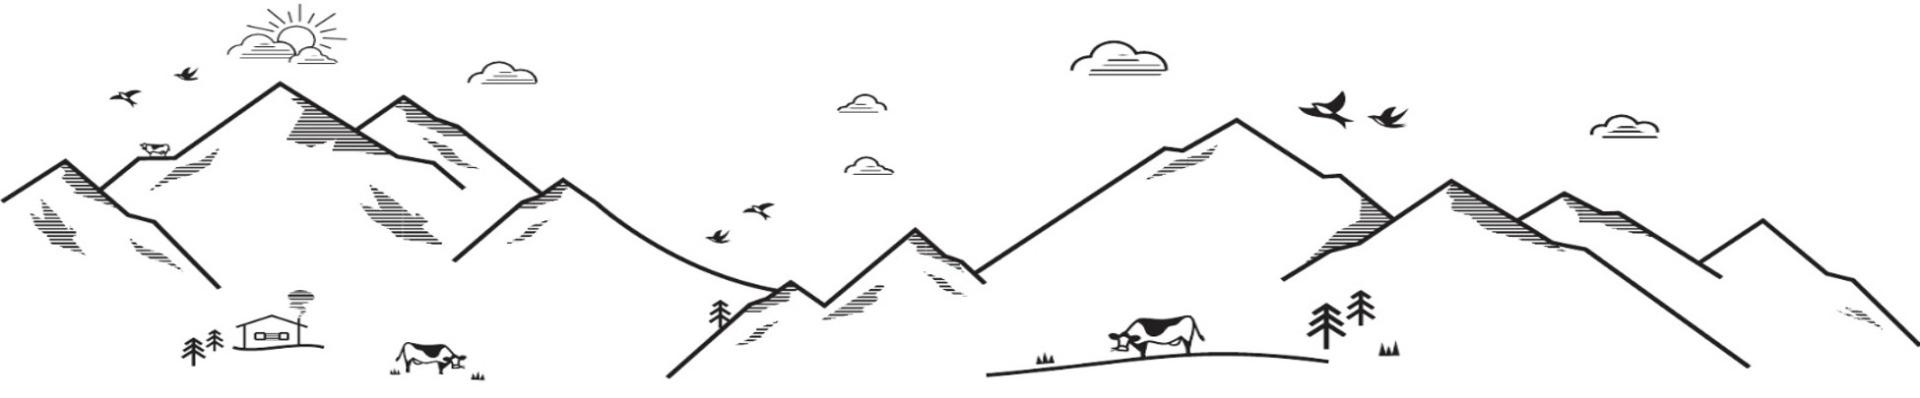 NUII Glace